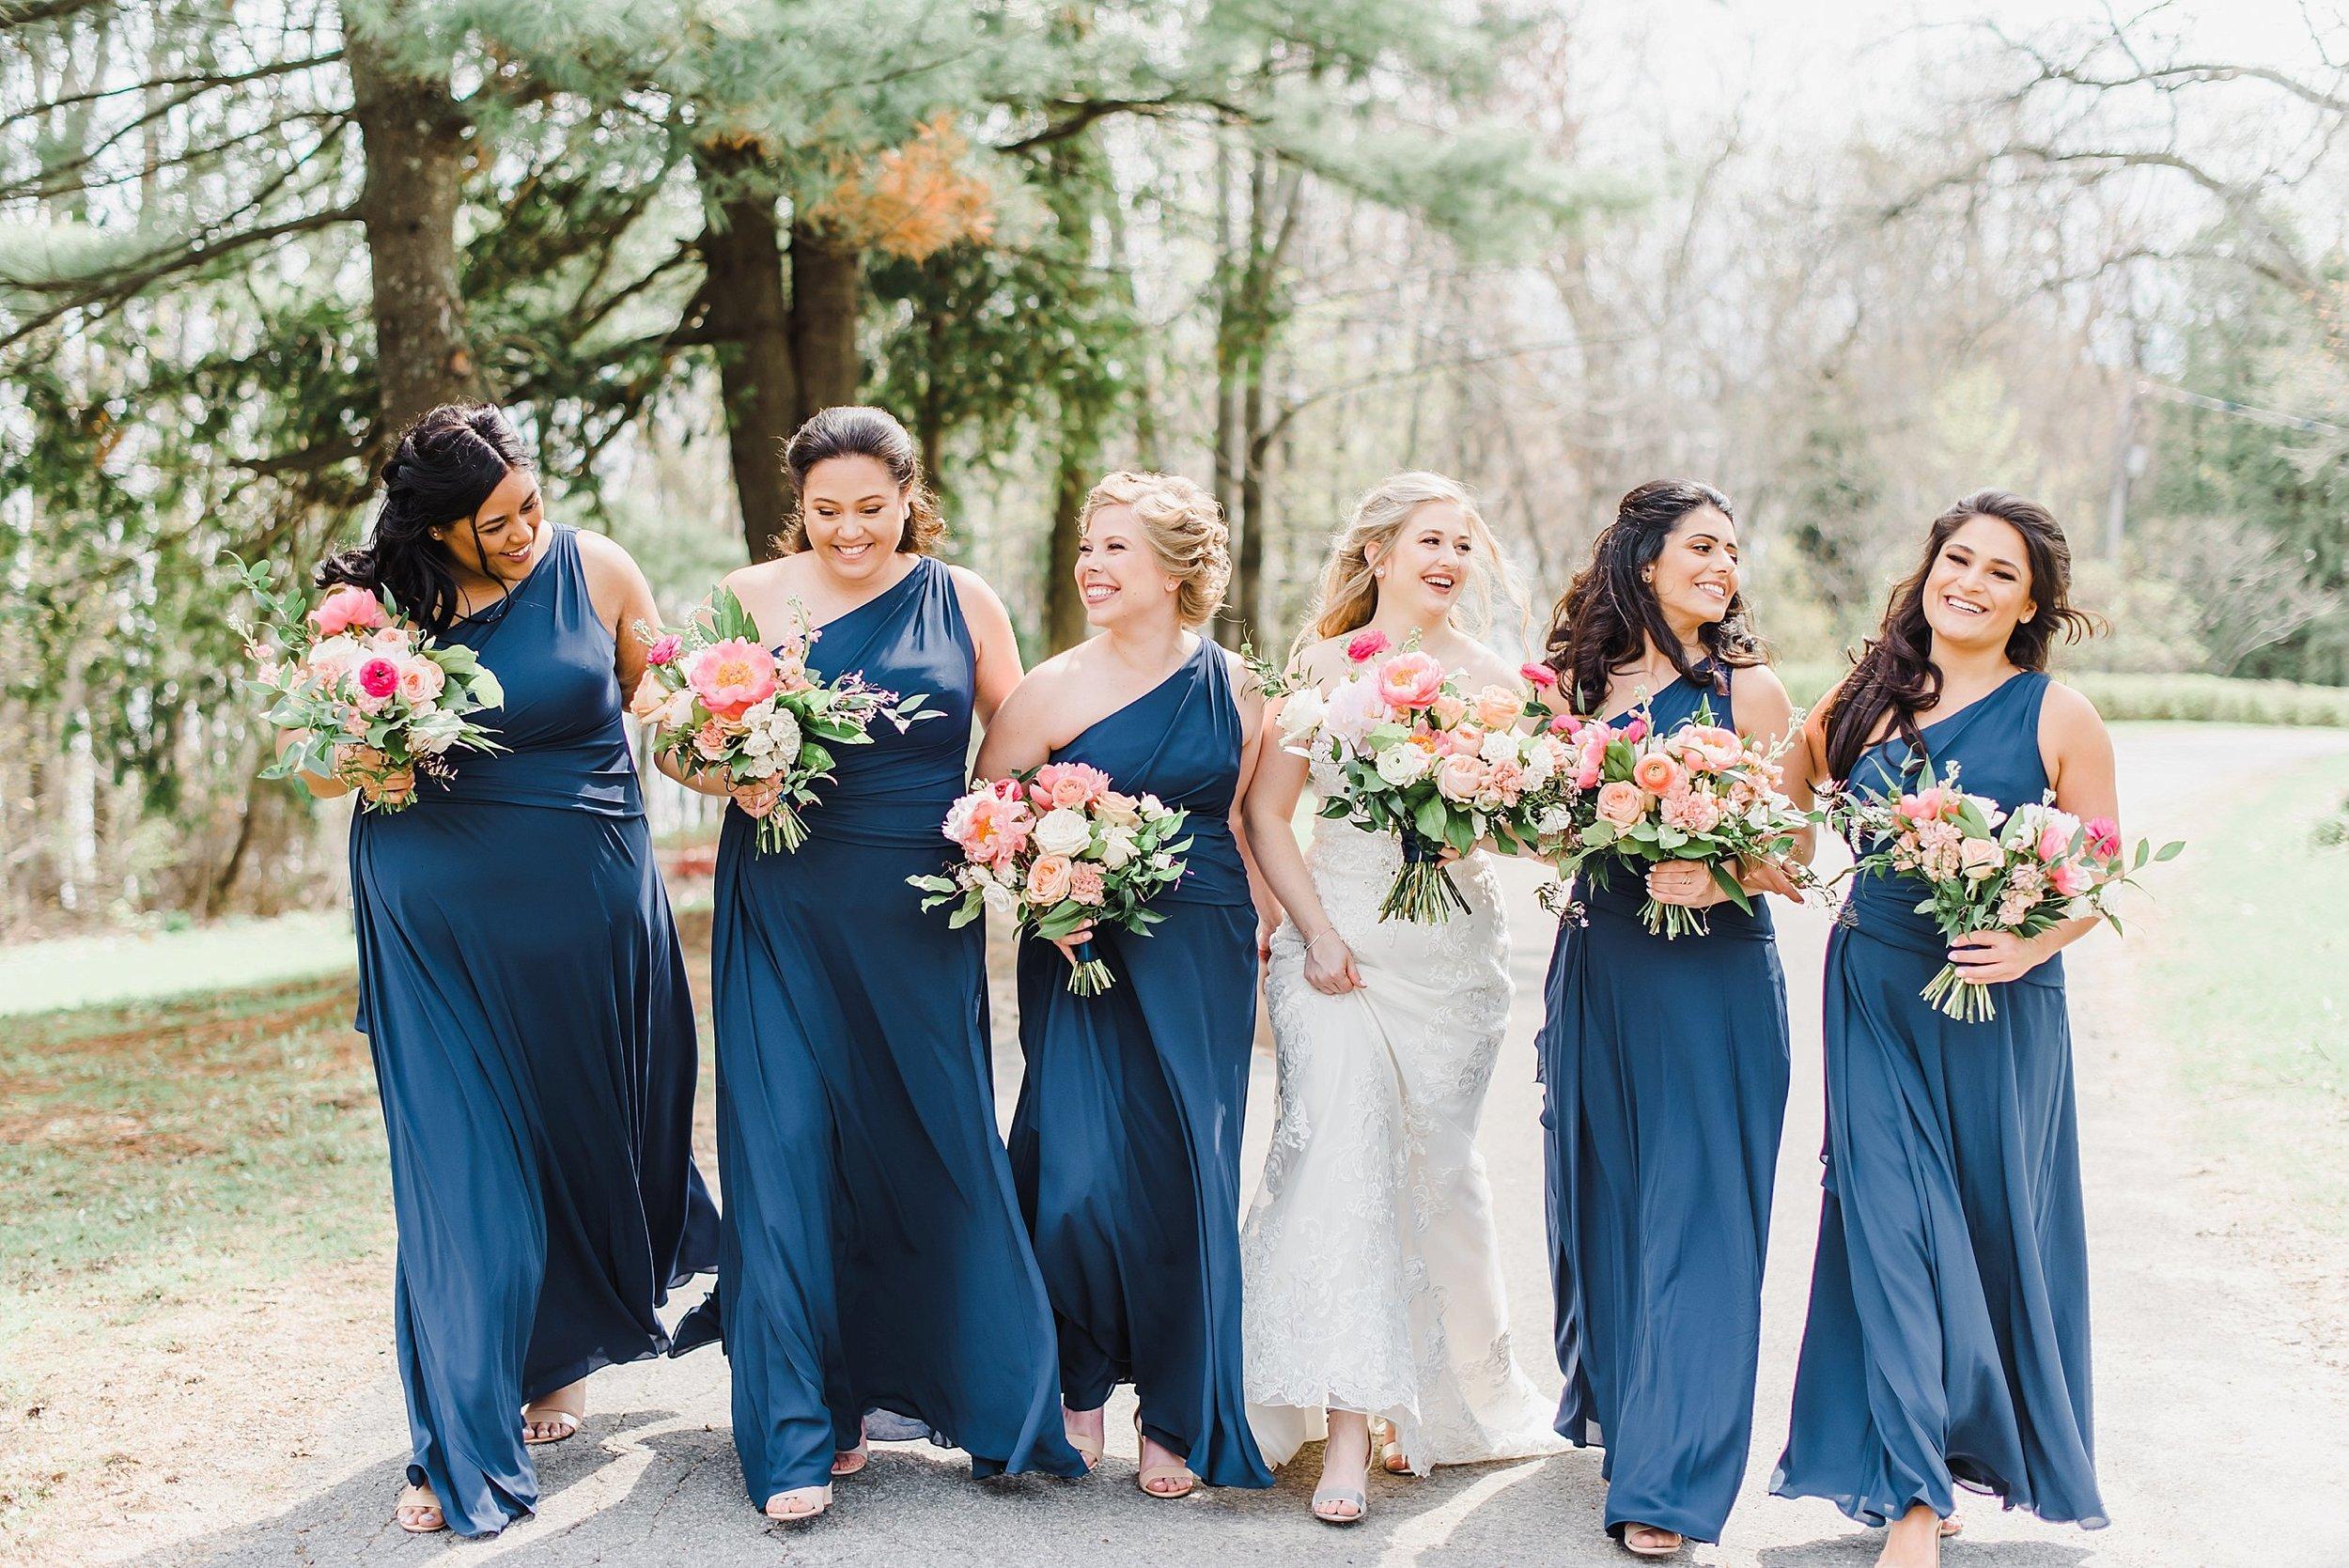 light airy indie fine art ottawa wedding photographer | Ali and Batoul Photography_0138.jpg